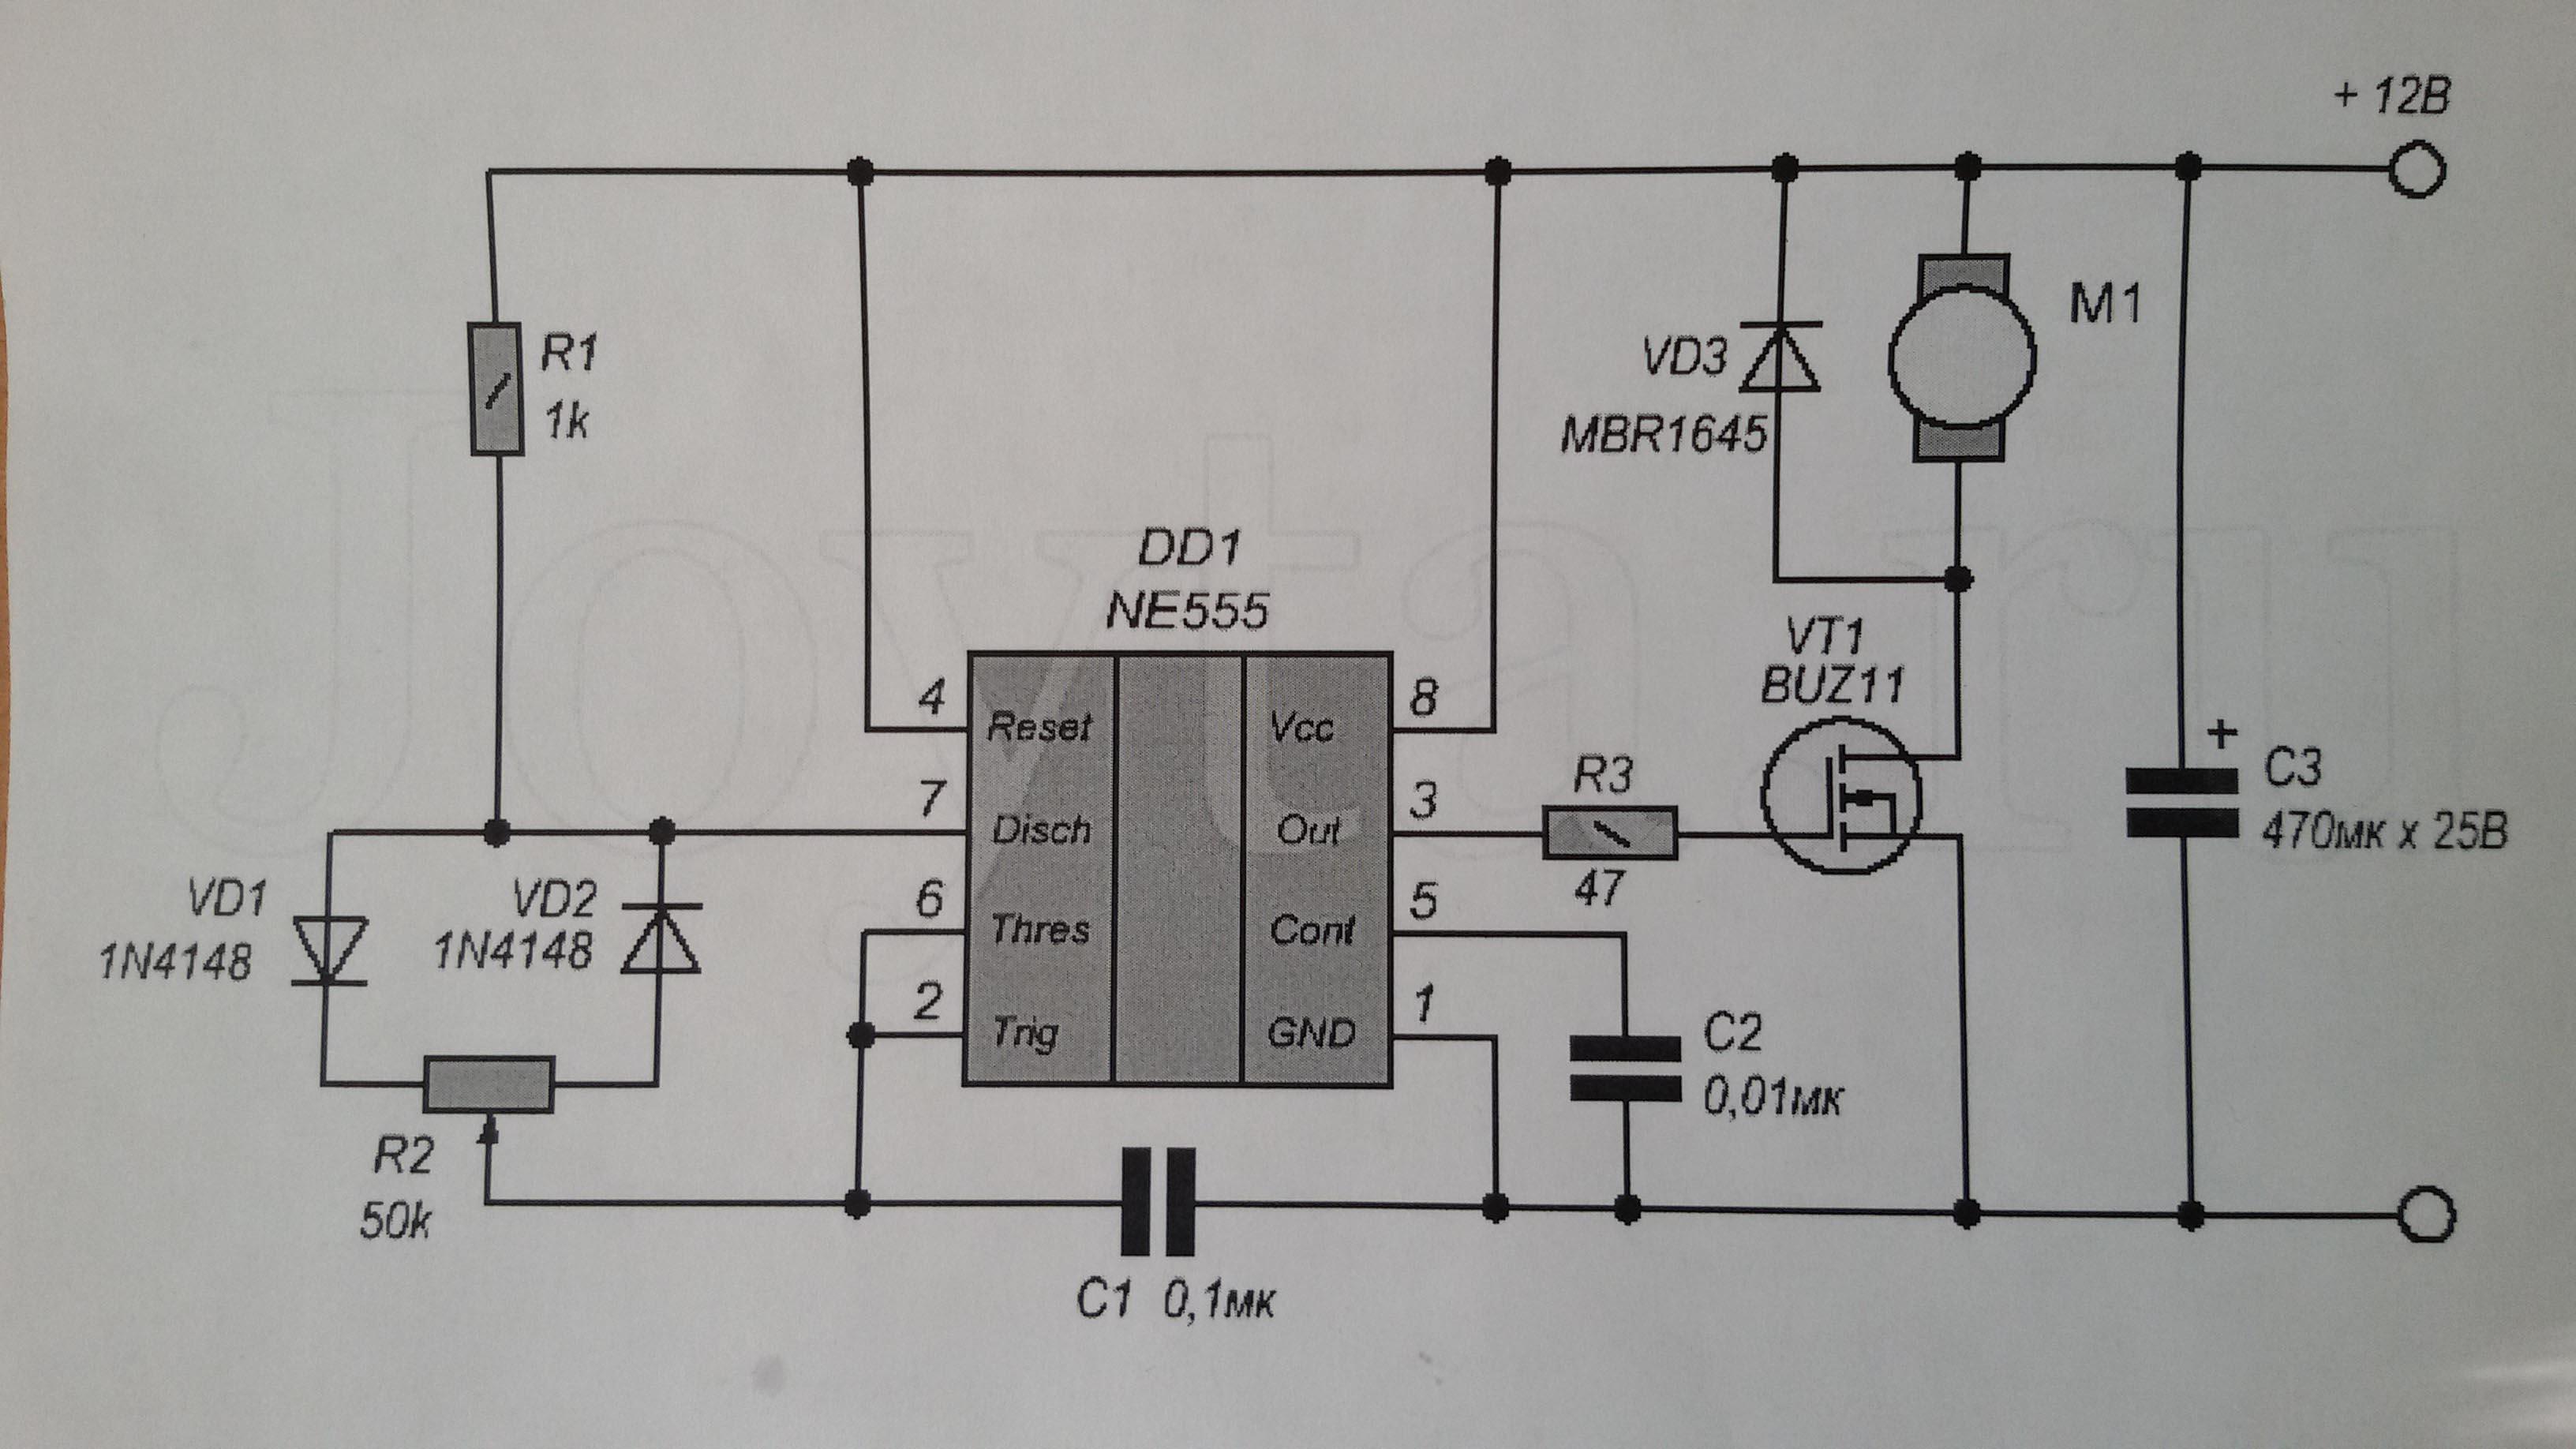 Регулятор для коллекторного двигателя своими руками